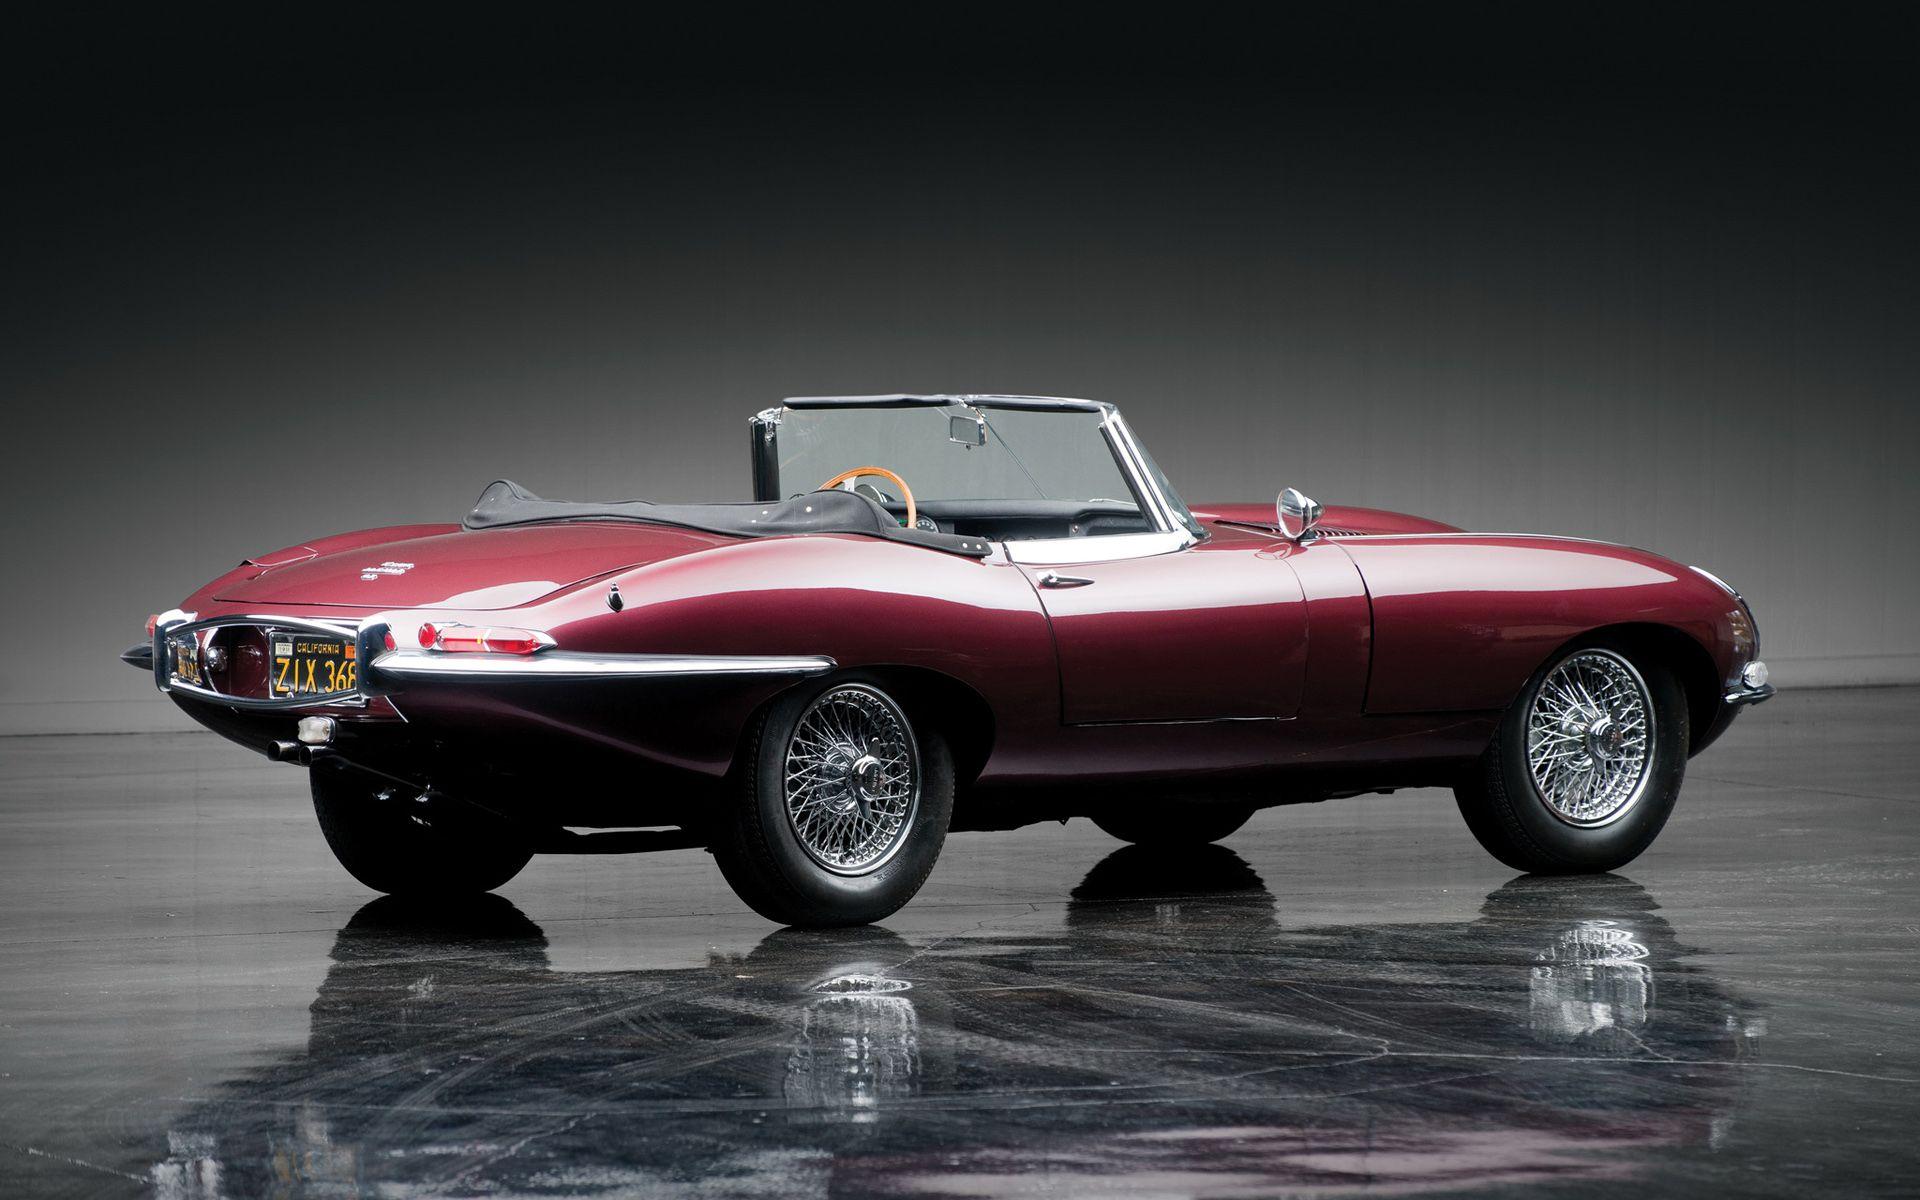 1961 Jaguar E Type Classic Cars Wallpaper 1920x1200 71741